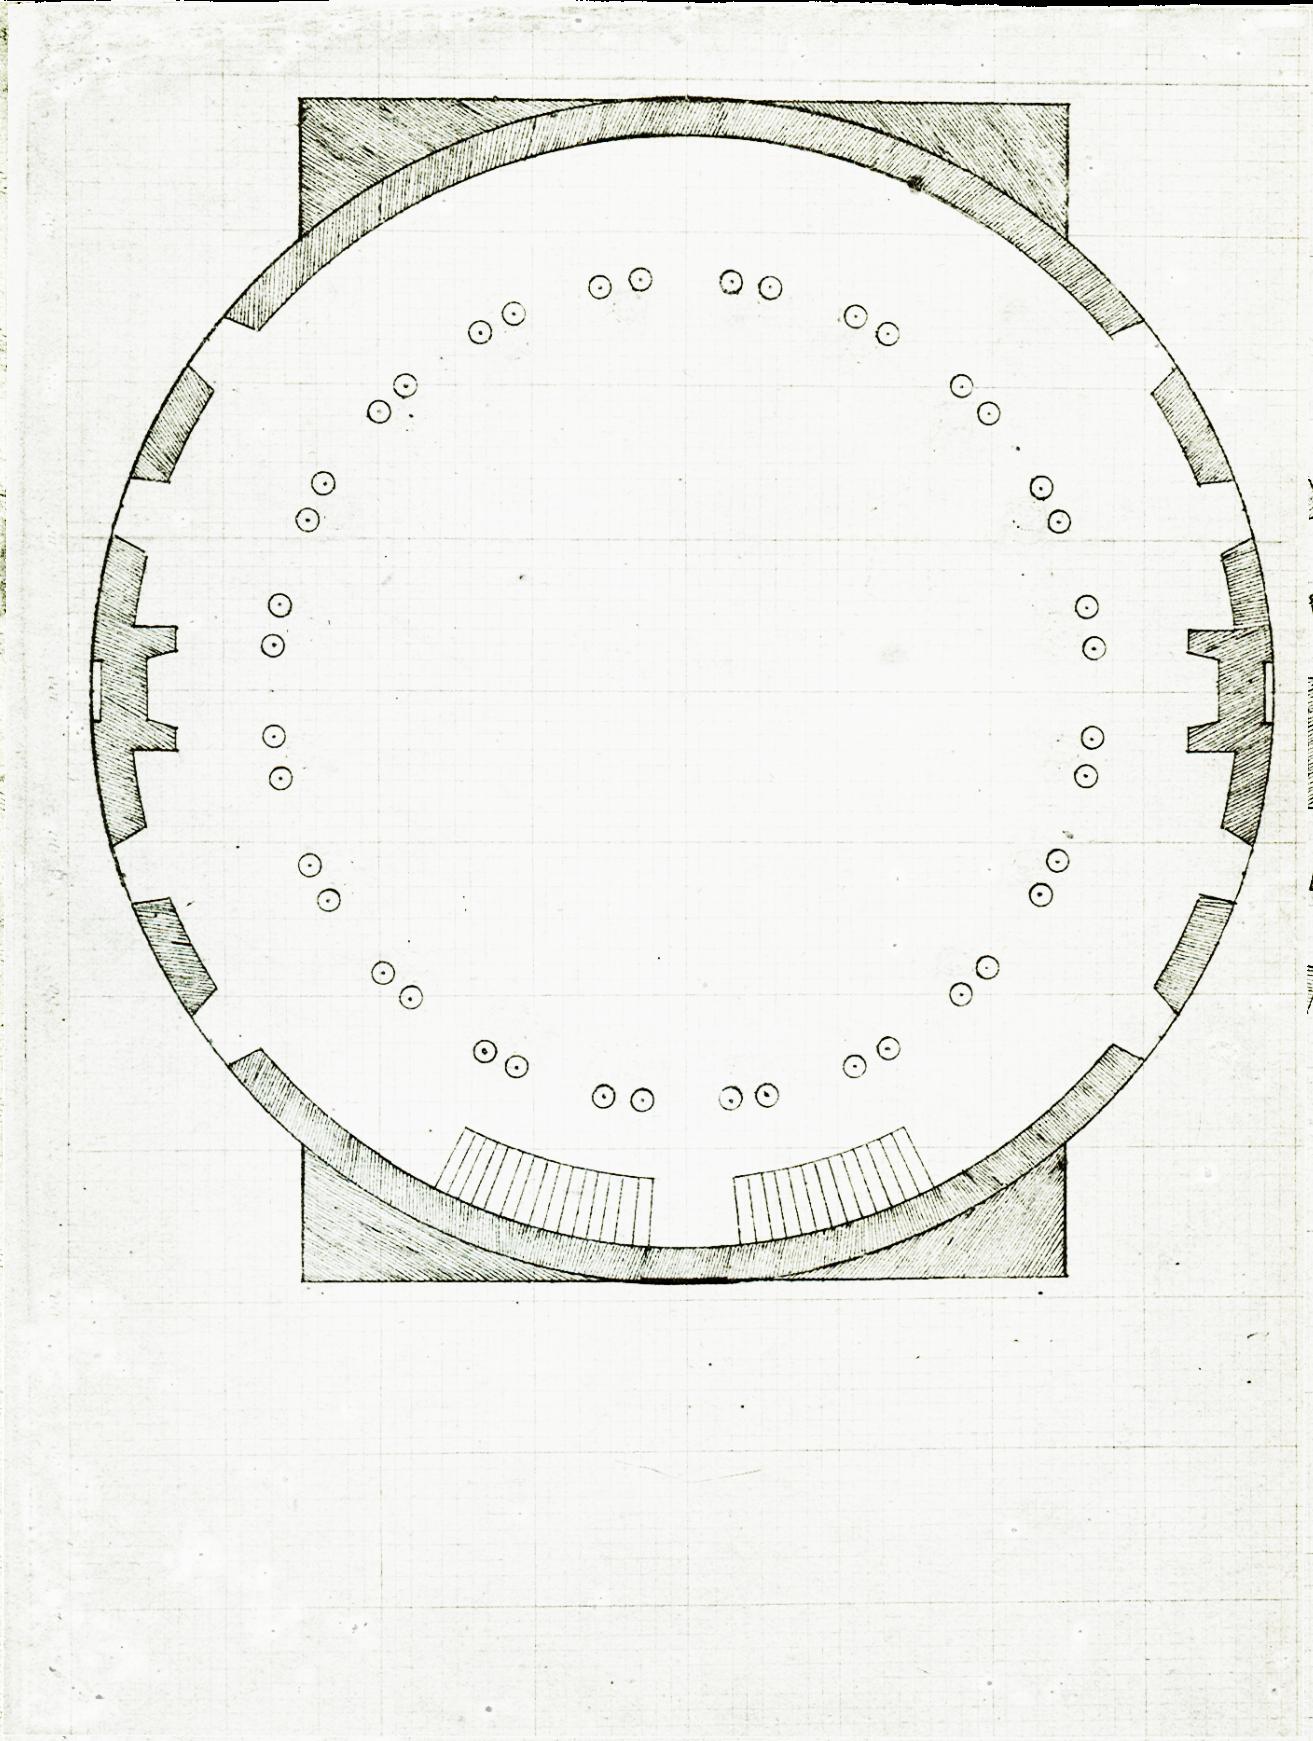 Fileuniversity Of Virginia Rotunda Plan Dome Room Retouchedpng